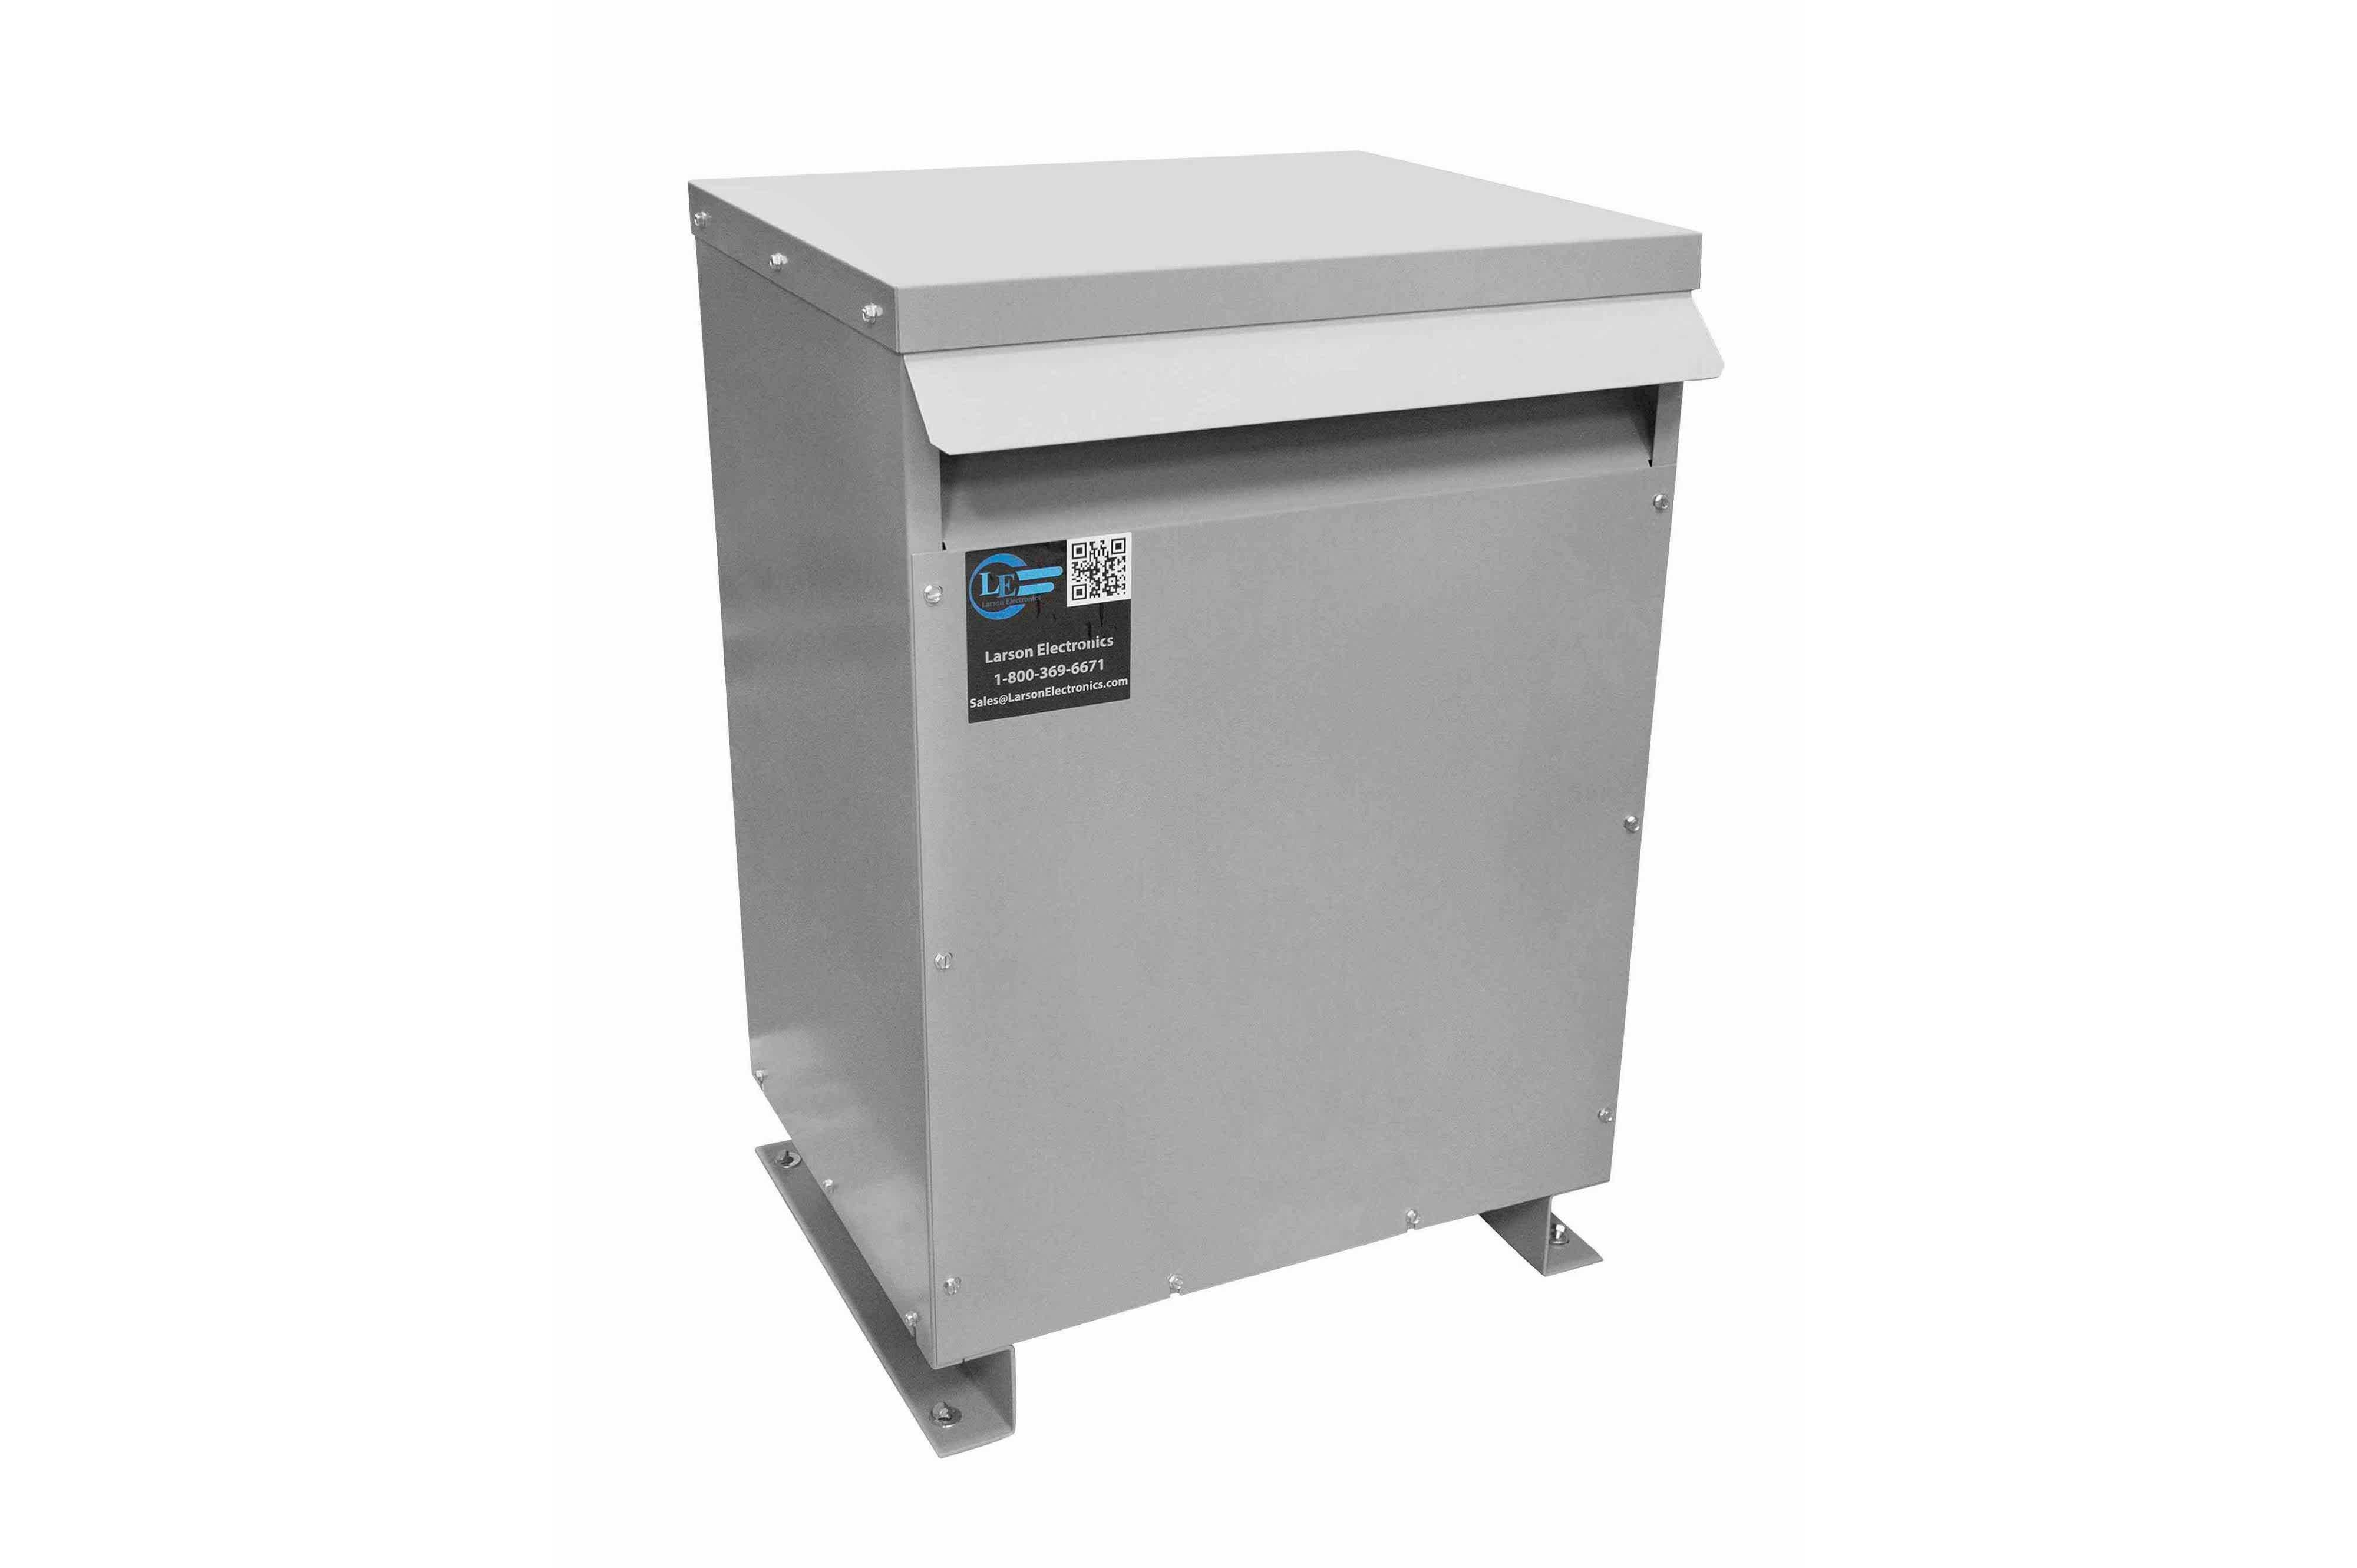 25 kVA 3PH DOE Transformer, 575V Delta Primary, 208Y/120 Wye-N Secondary, N3R, Ventilated, 60 Hz